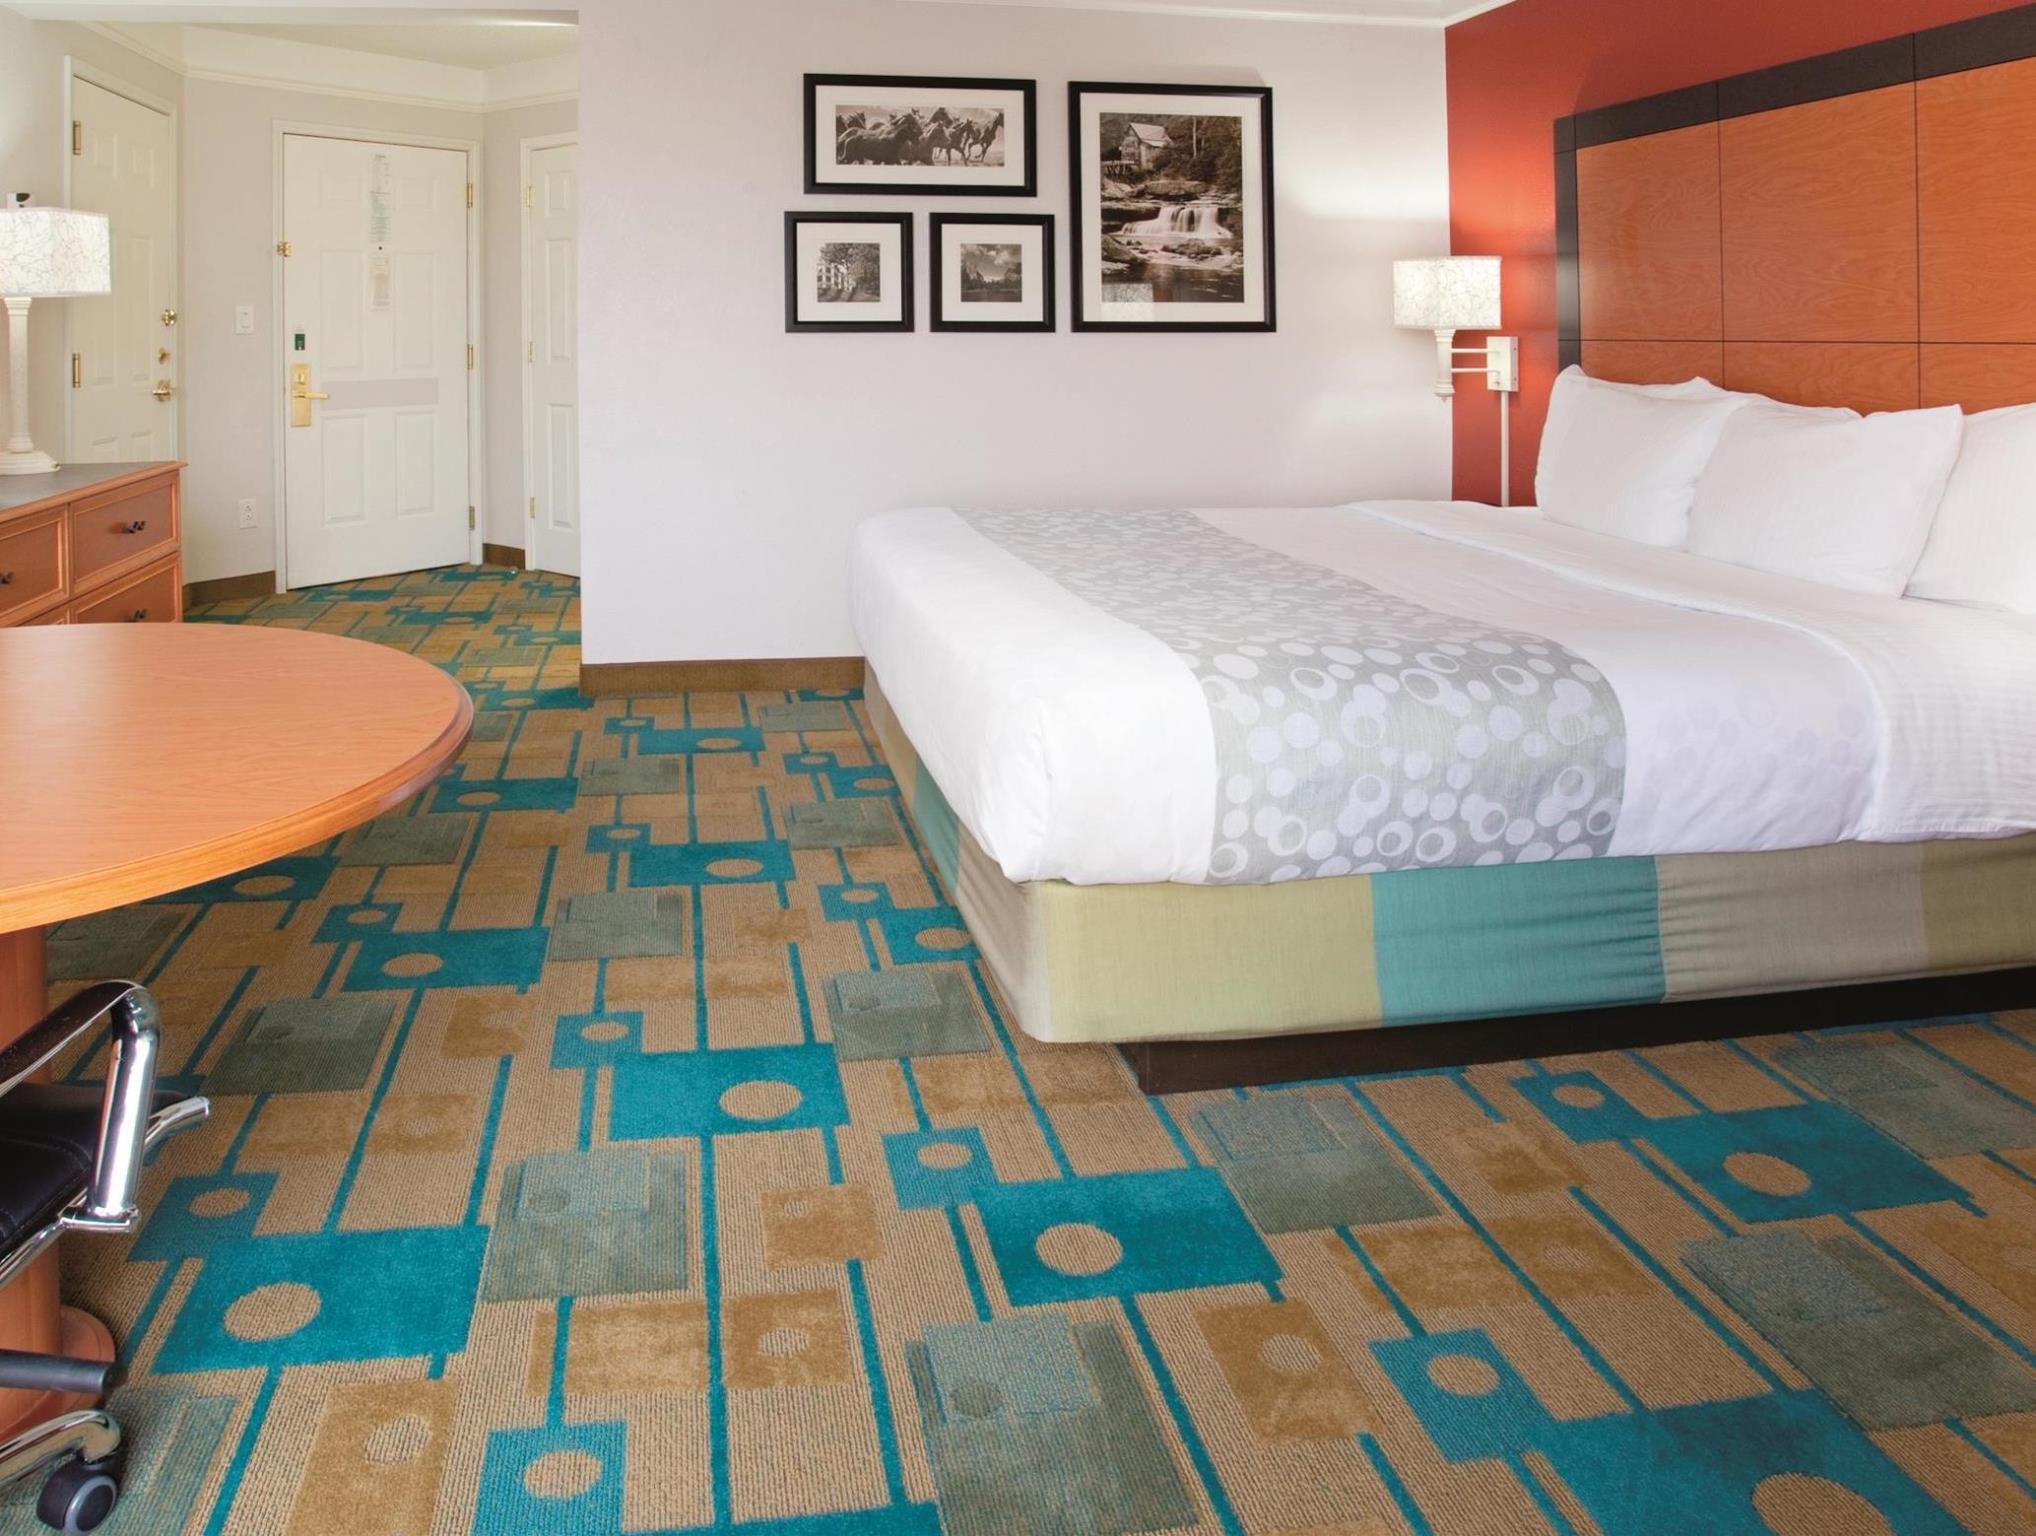 La Quinta Inn & Suites By Wyndham Albuquerque West